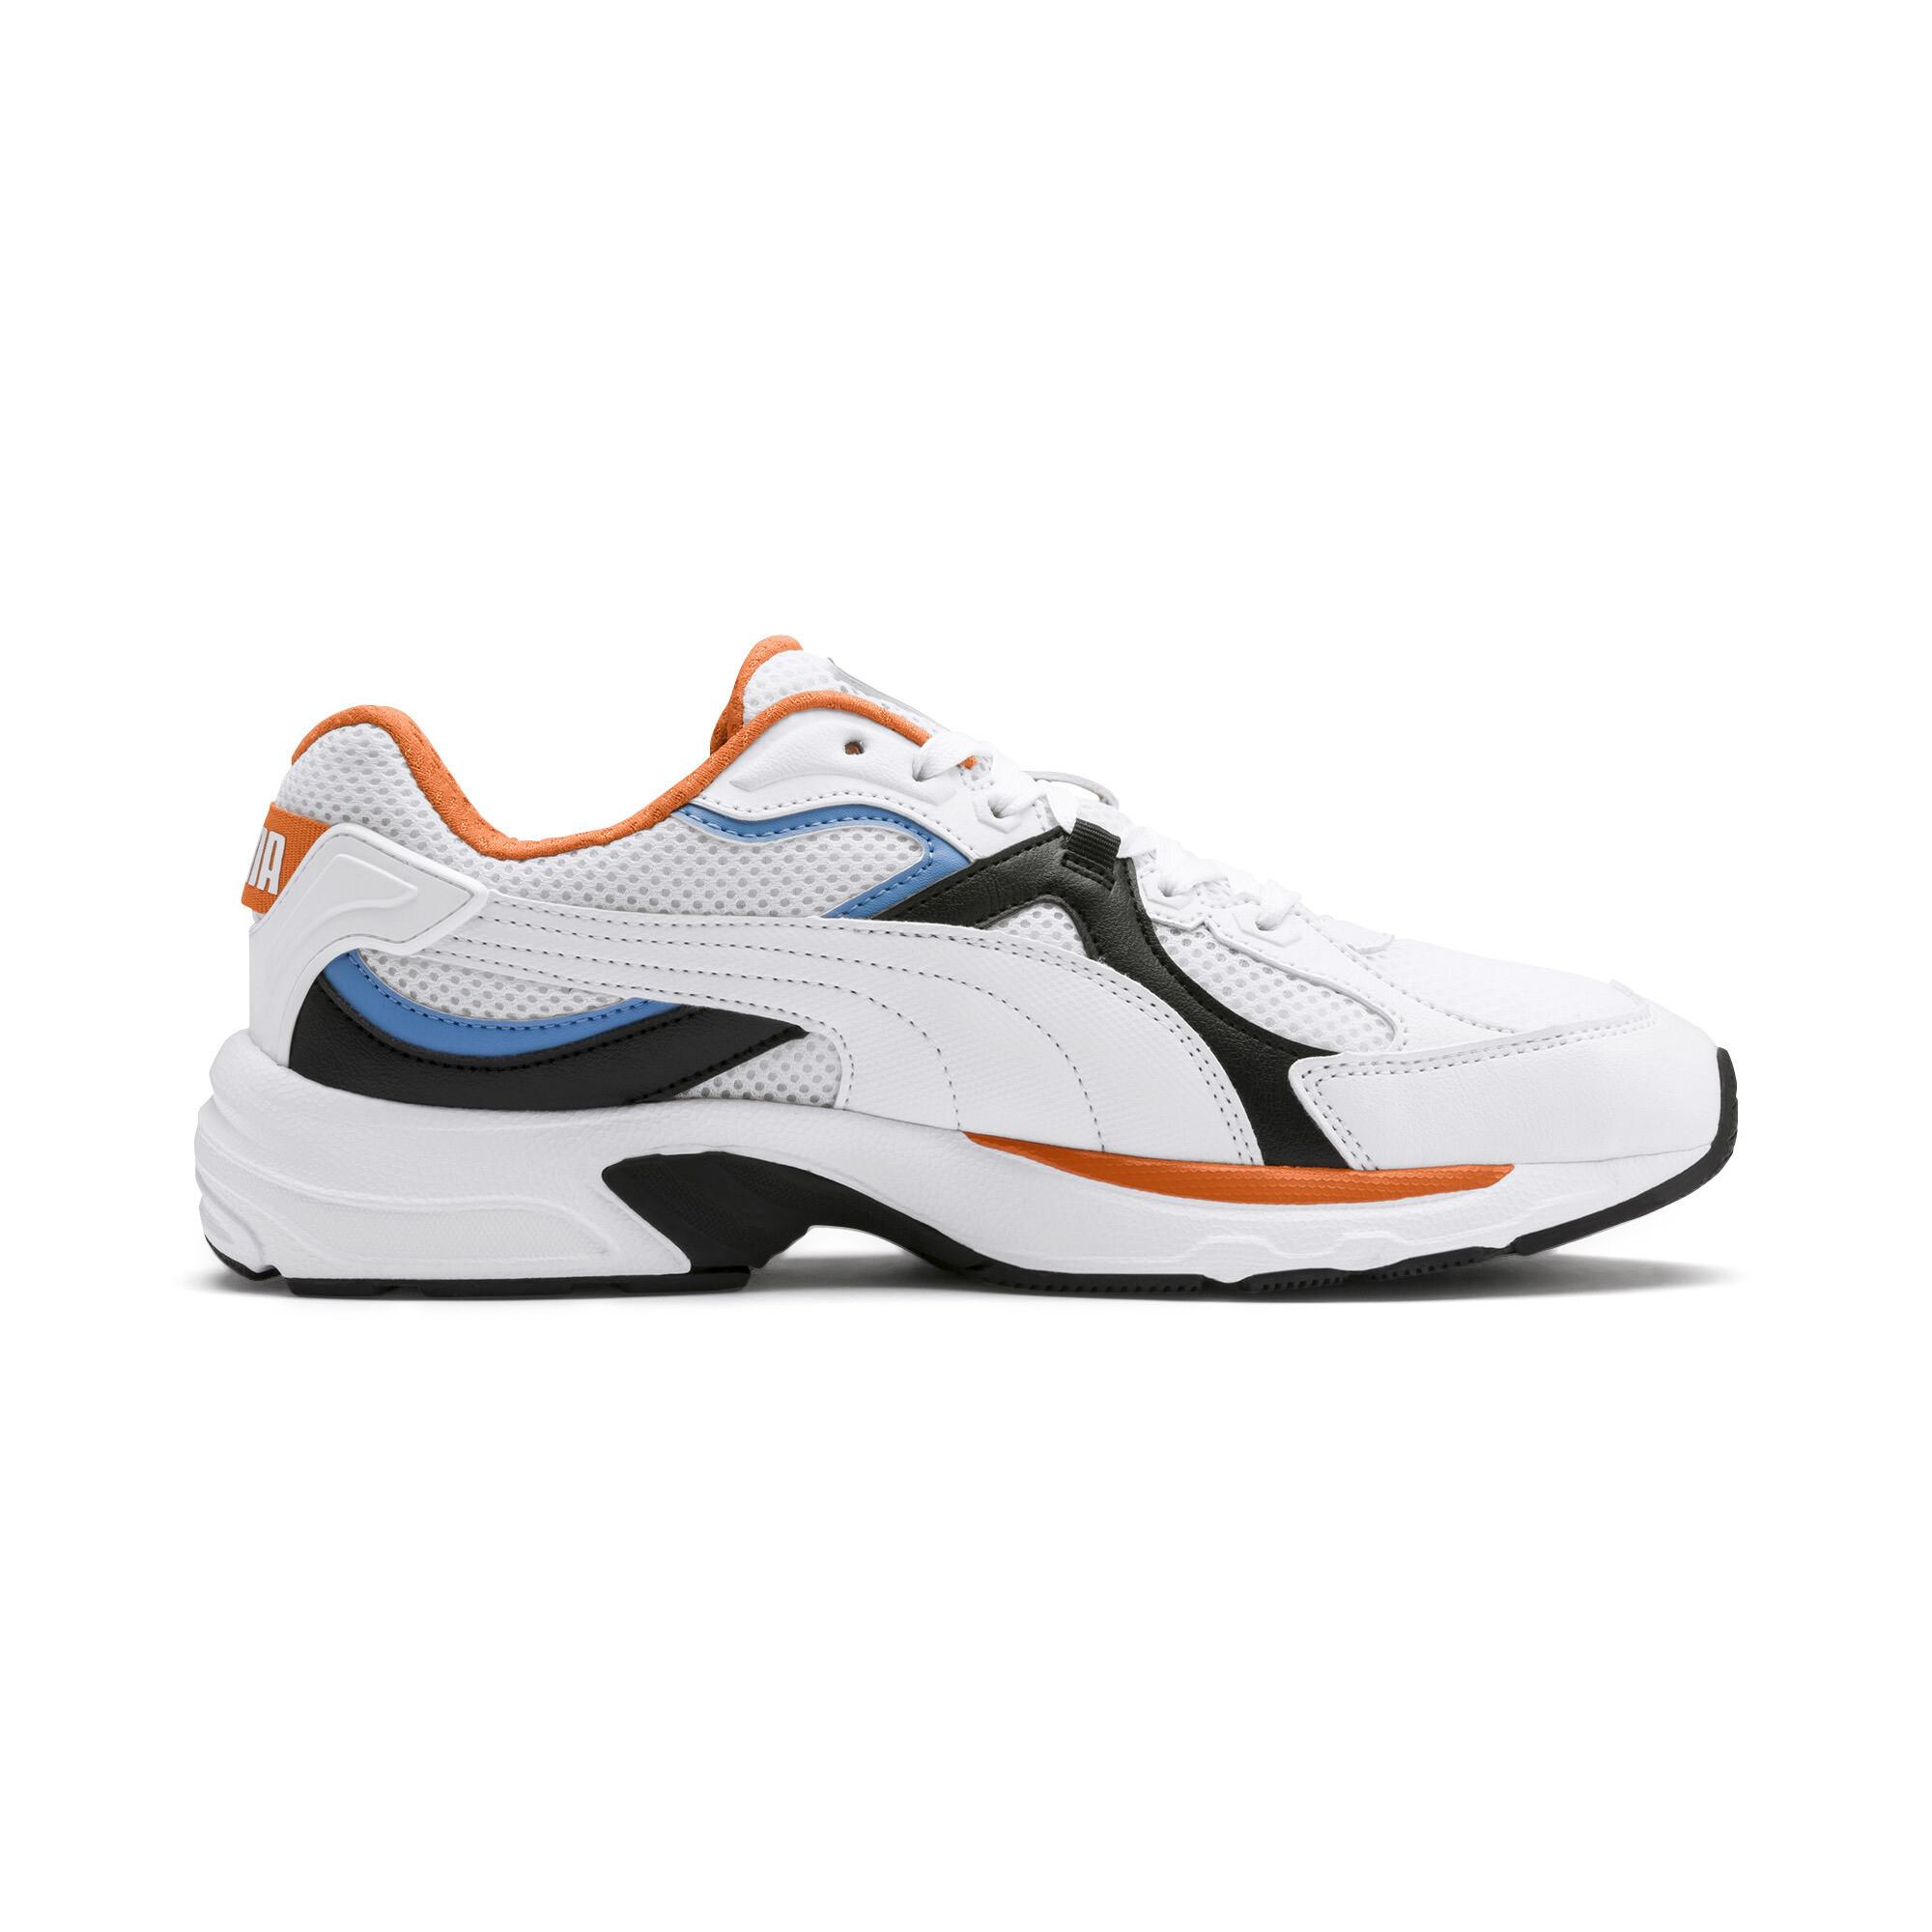 PUMA-Axis-Plus-90s-Sneakers-Men-Shoe-Basics thumbnail 20